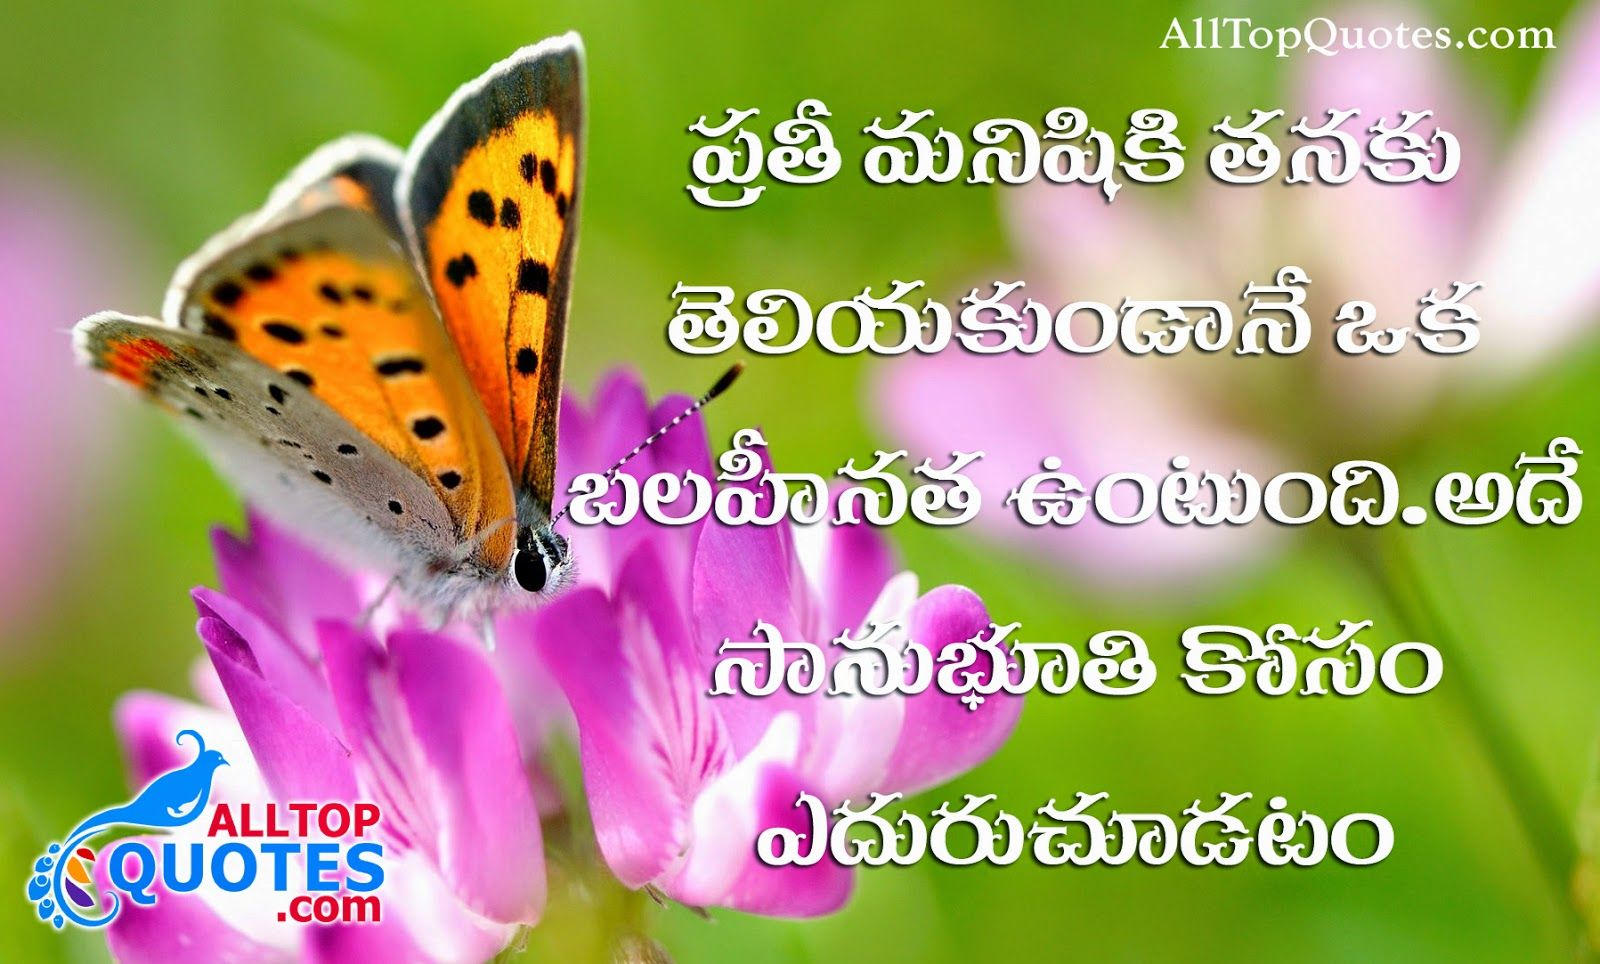 Life Inspirational Quotes In Telugu Wallpaper Top Telugu